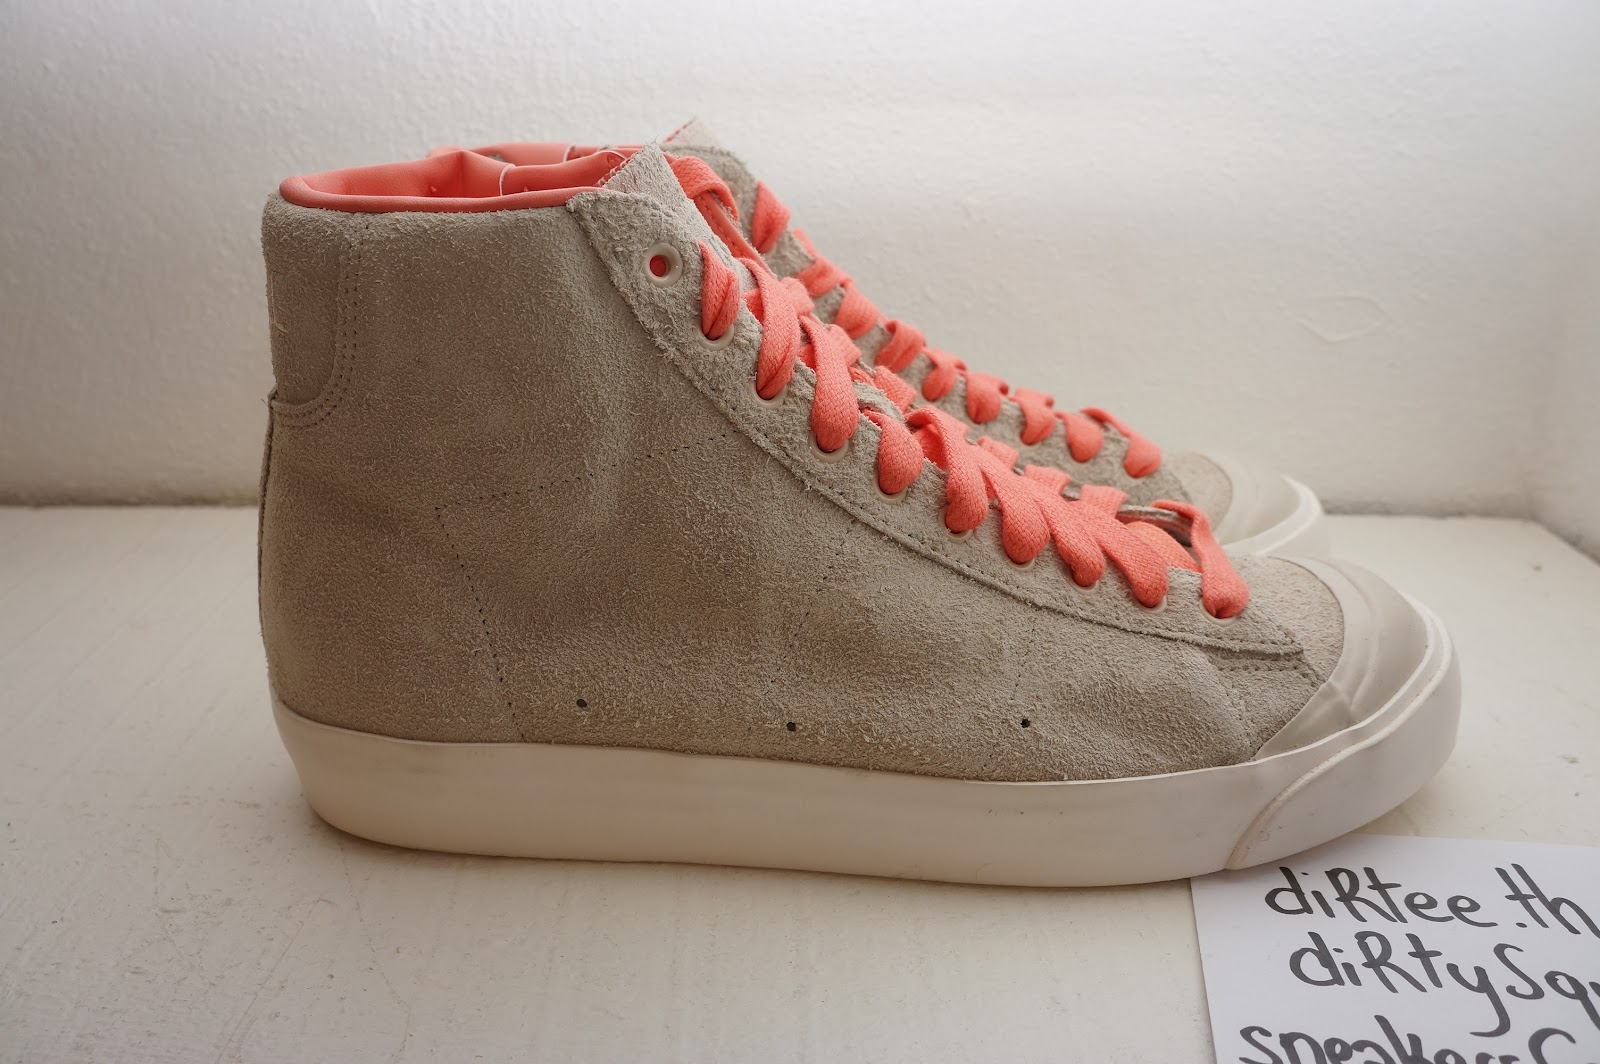 sneakers from Paris  NIKE - Blazer Mid AB - SAMPLE Mango dcd4e84389